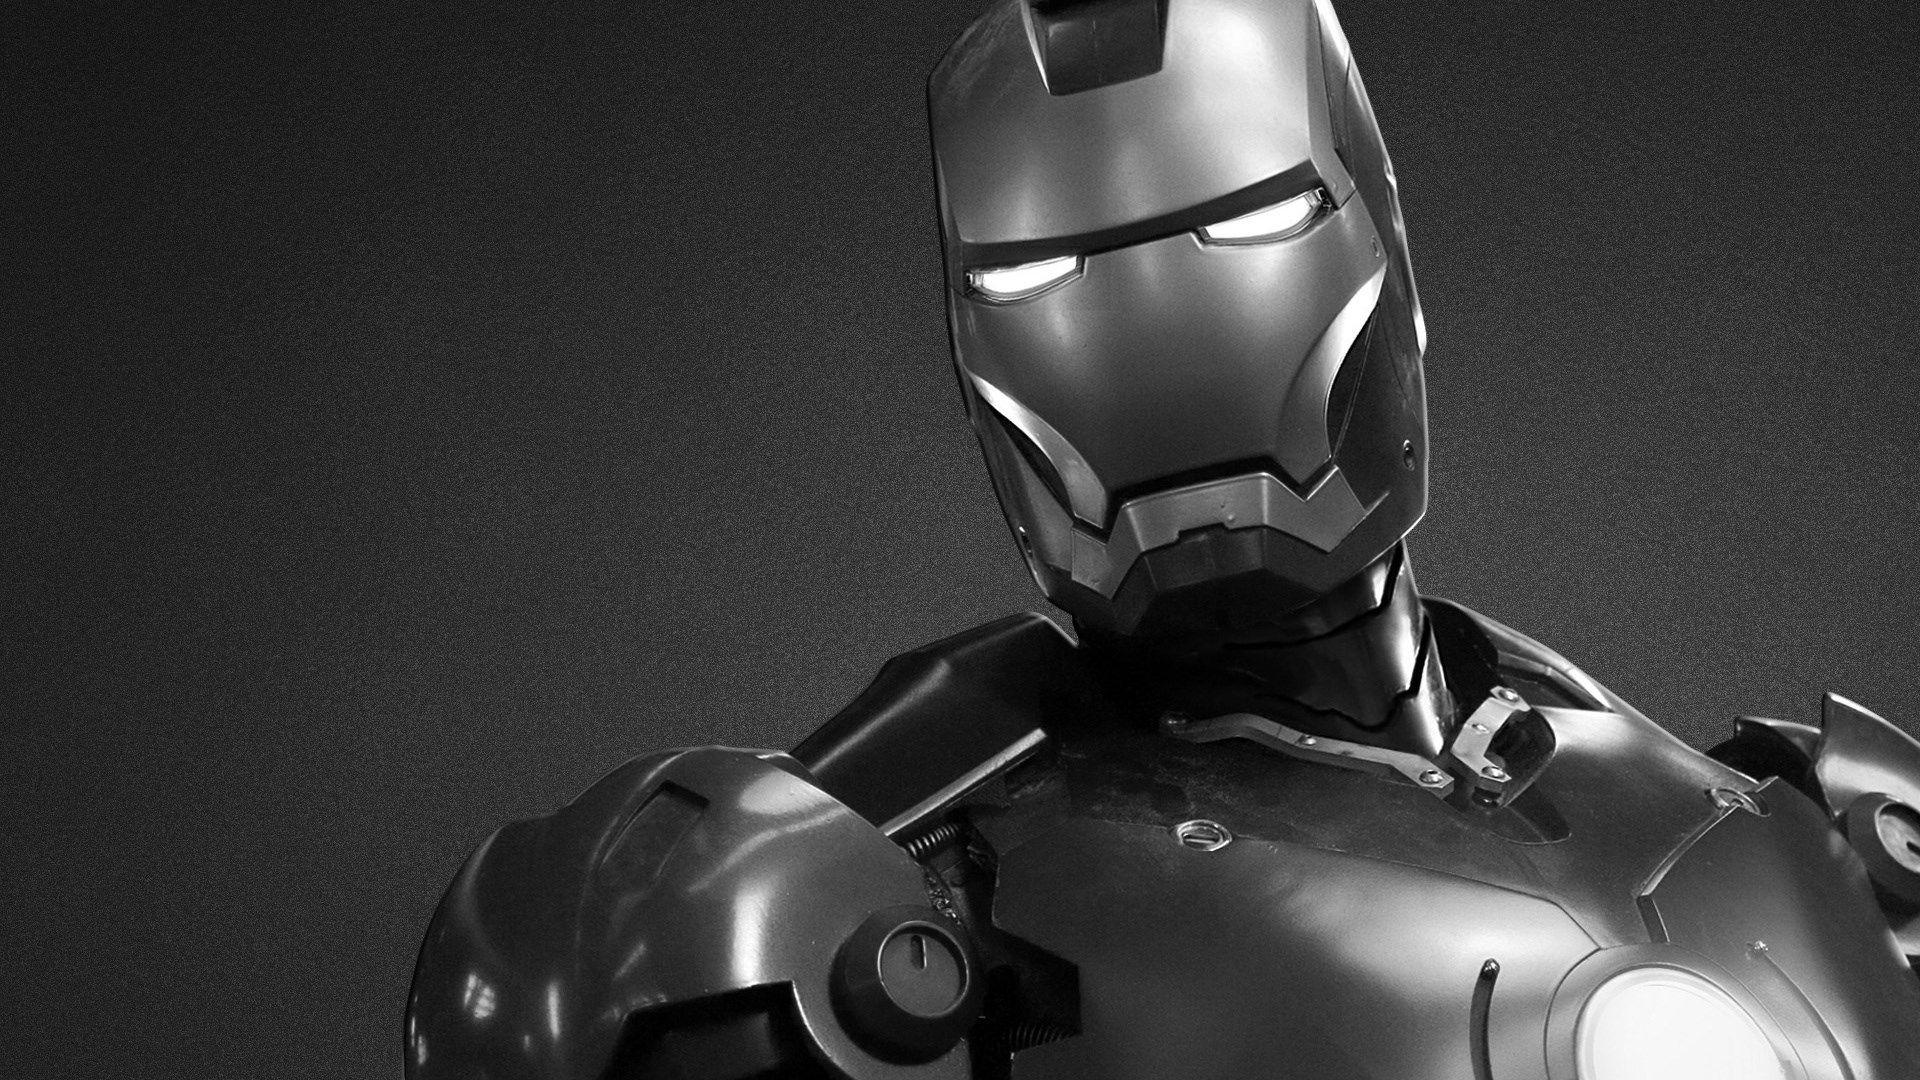 Iron Man Desktop Wallpaper Free Iron Man Photos Iron Man Man Wallpaper